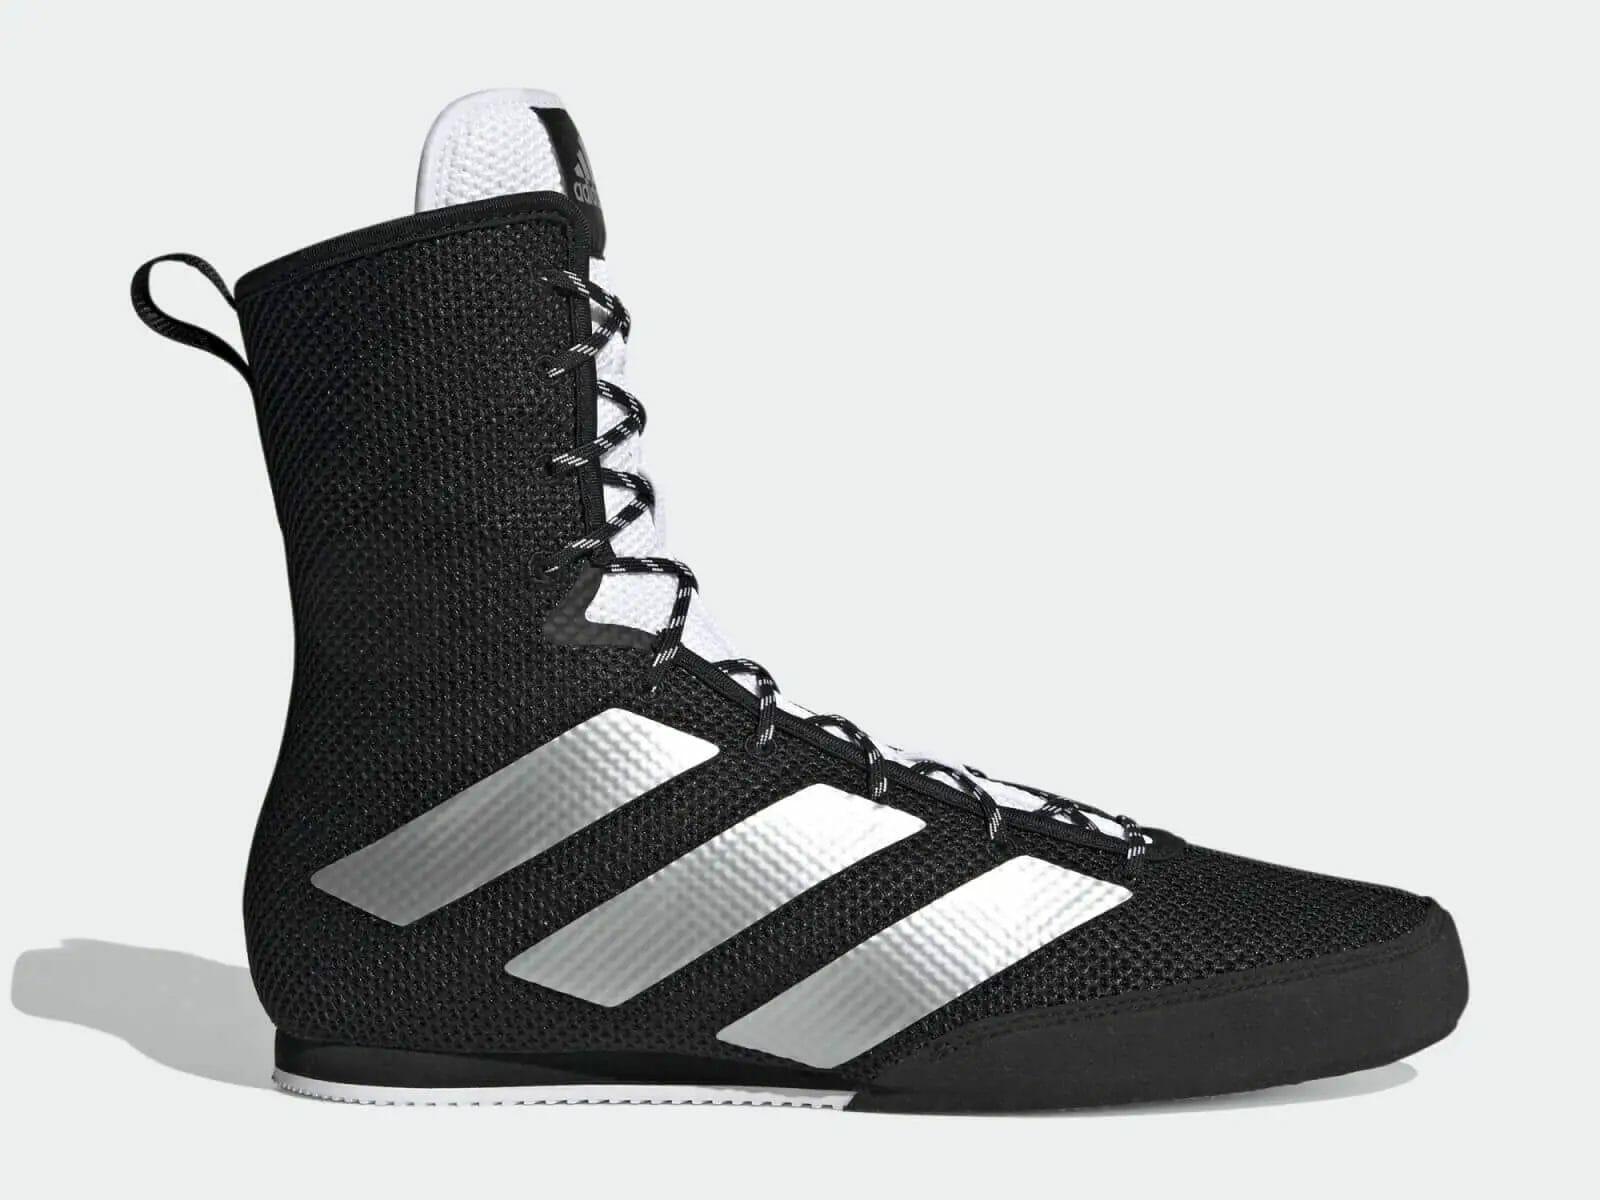 Profile of black and white adidas Box Hog 3